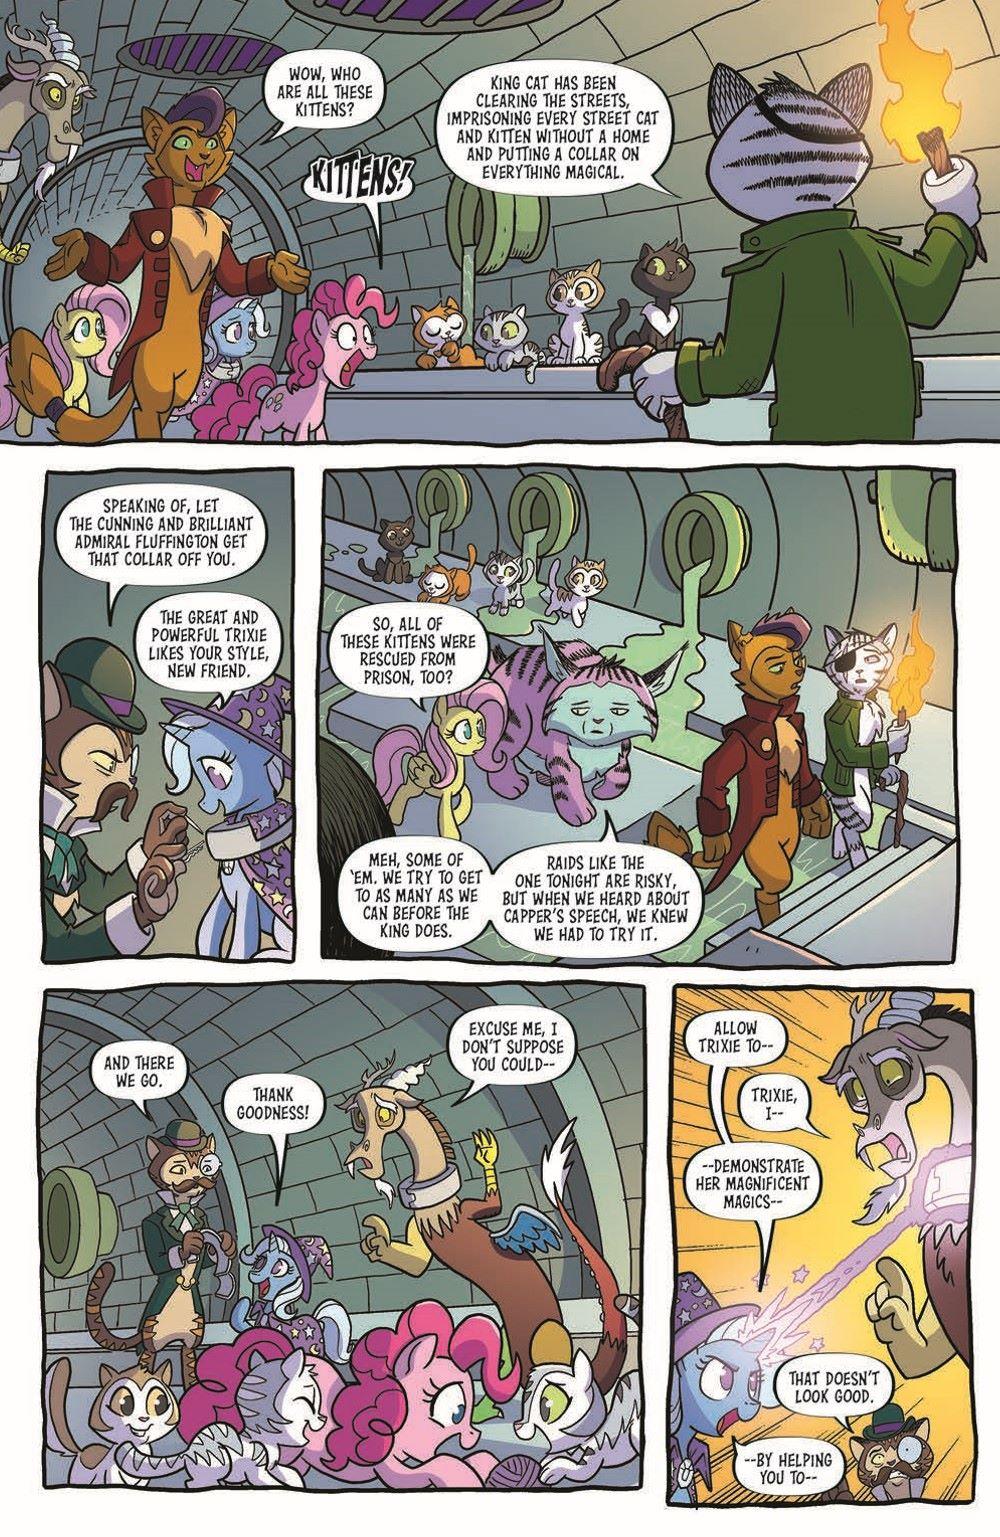 MLP97-pr-4 ComicList Previews: MY LITTLE PONY FRIENDSHIP IS MAGIC #97